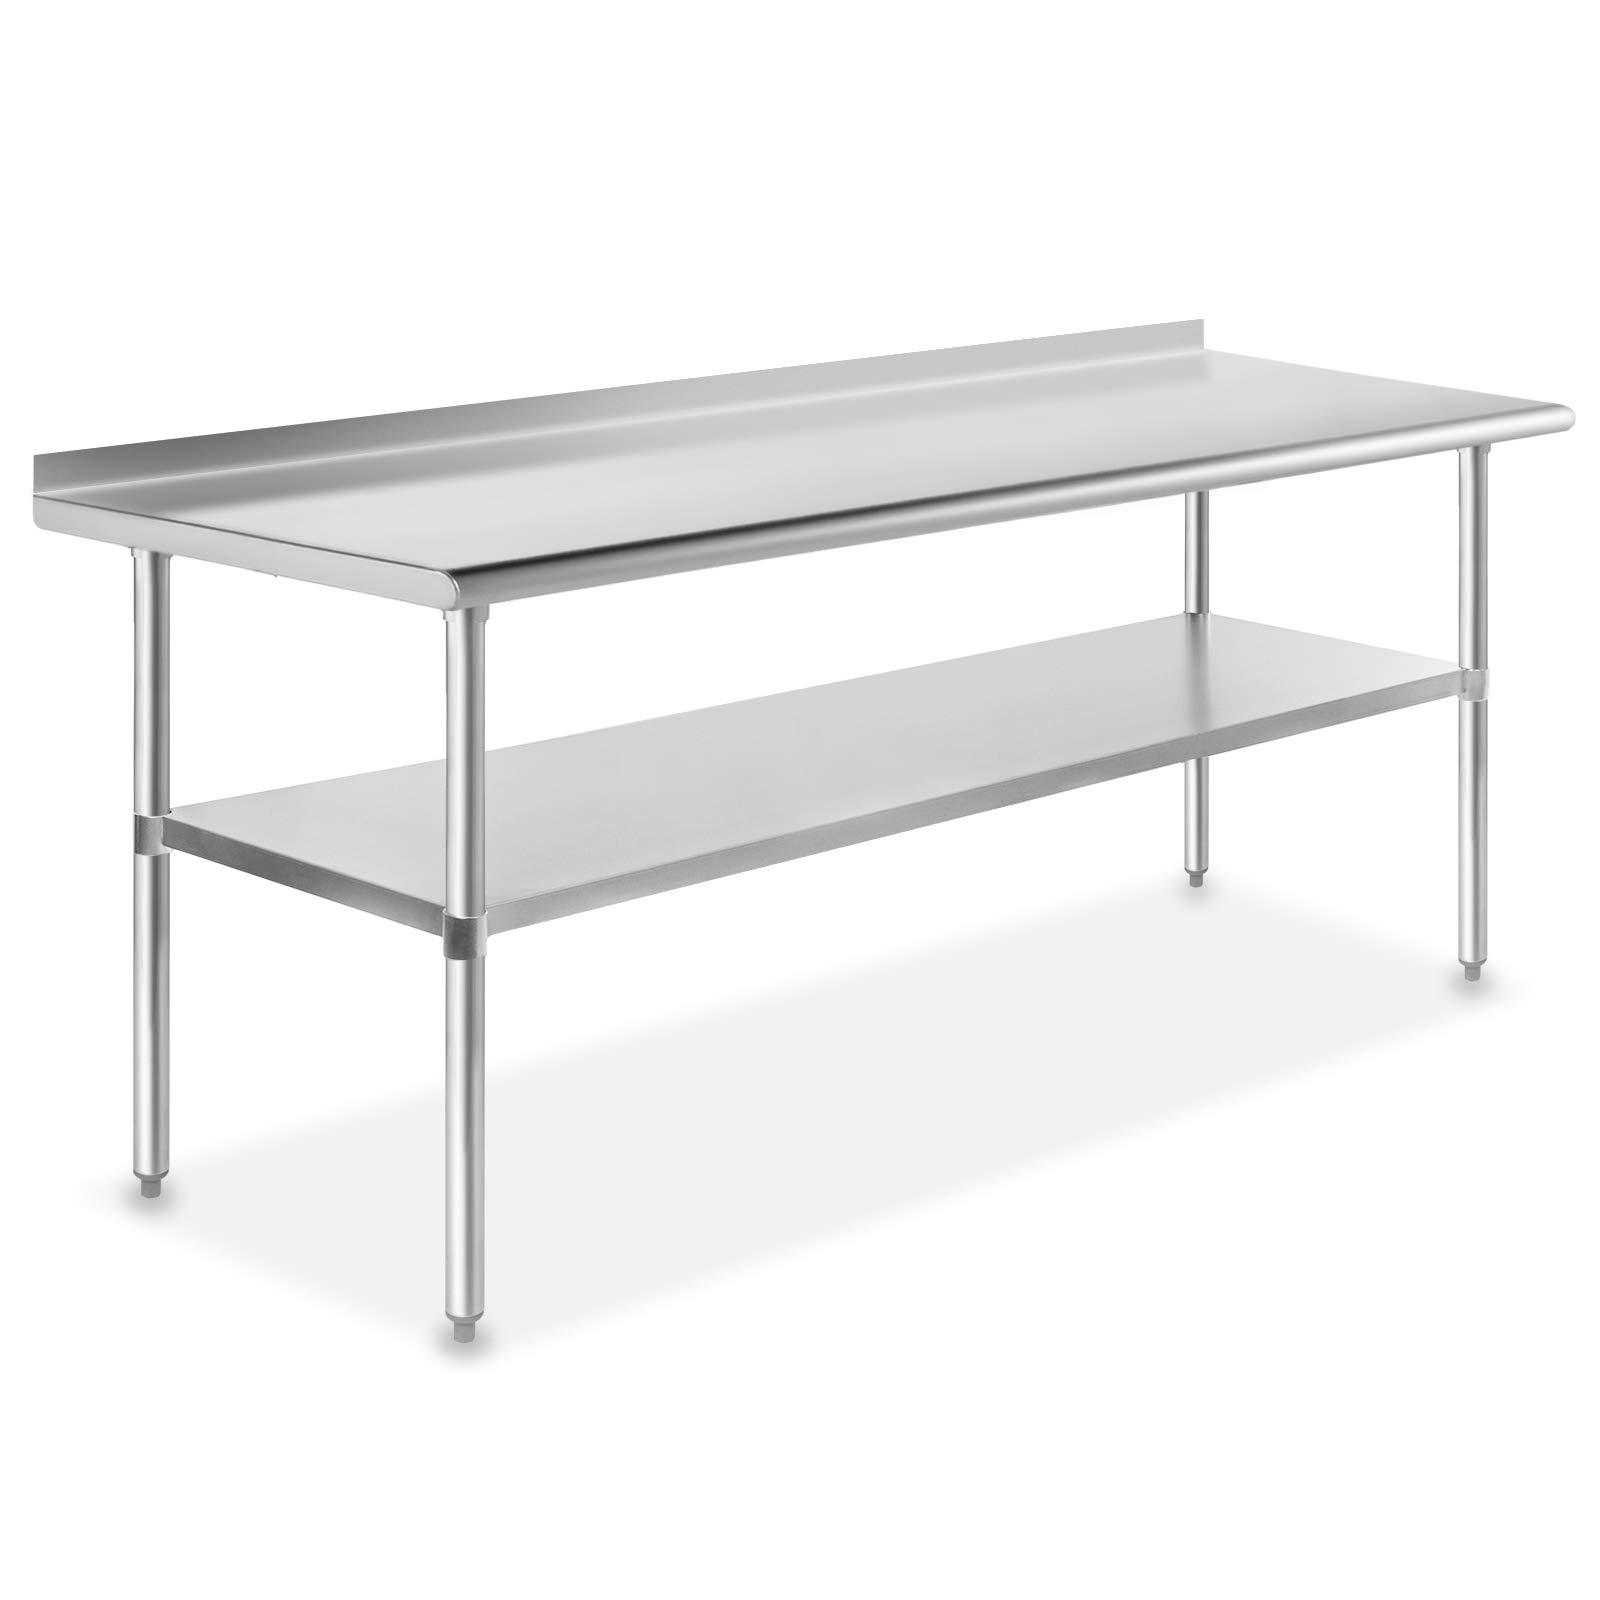 GRIDMANN NSF Stainless Steel Commercial Kitchen Prep & Work Table w/Backsplash - 72 in. x 24 in. by GRIDMANN